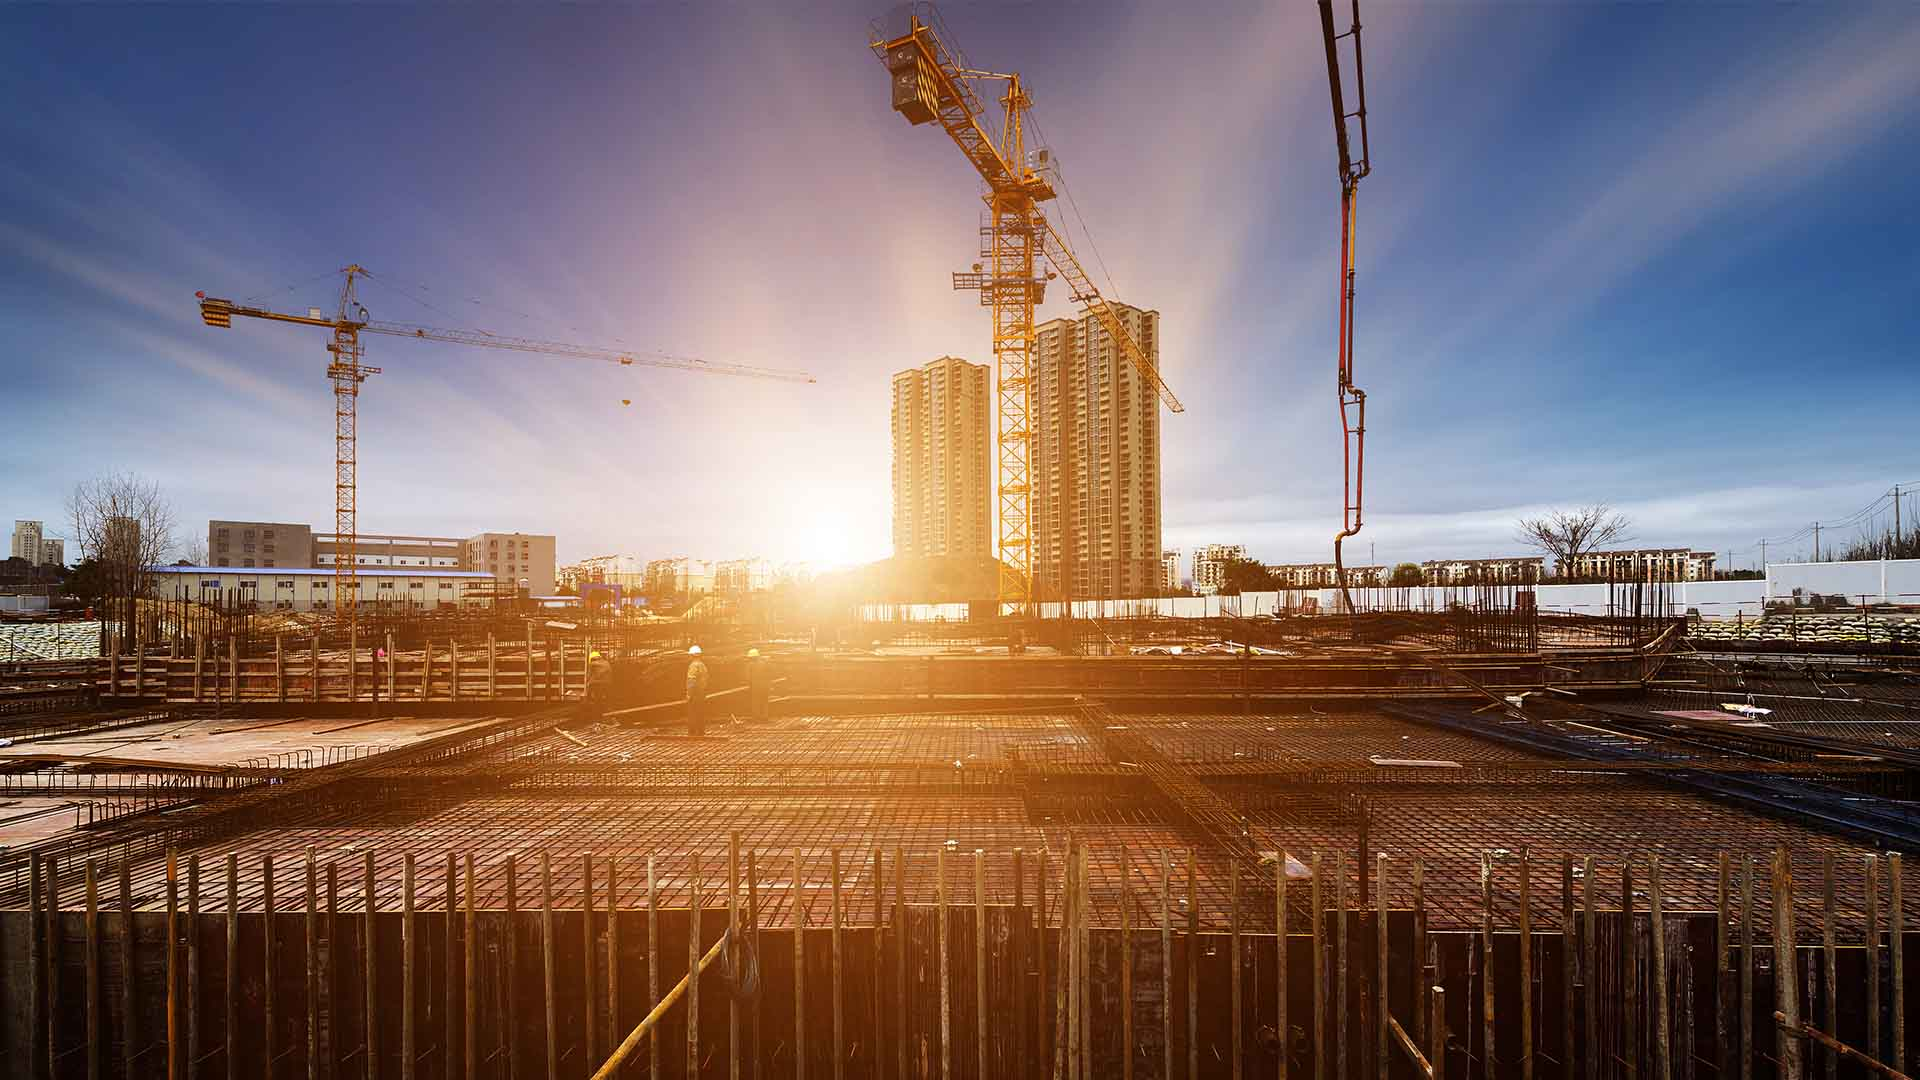 SBI, CREDAI sign MOU towards development of Real Estate